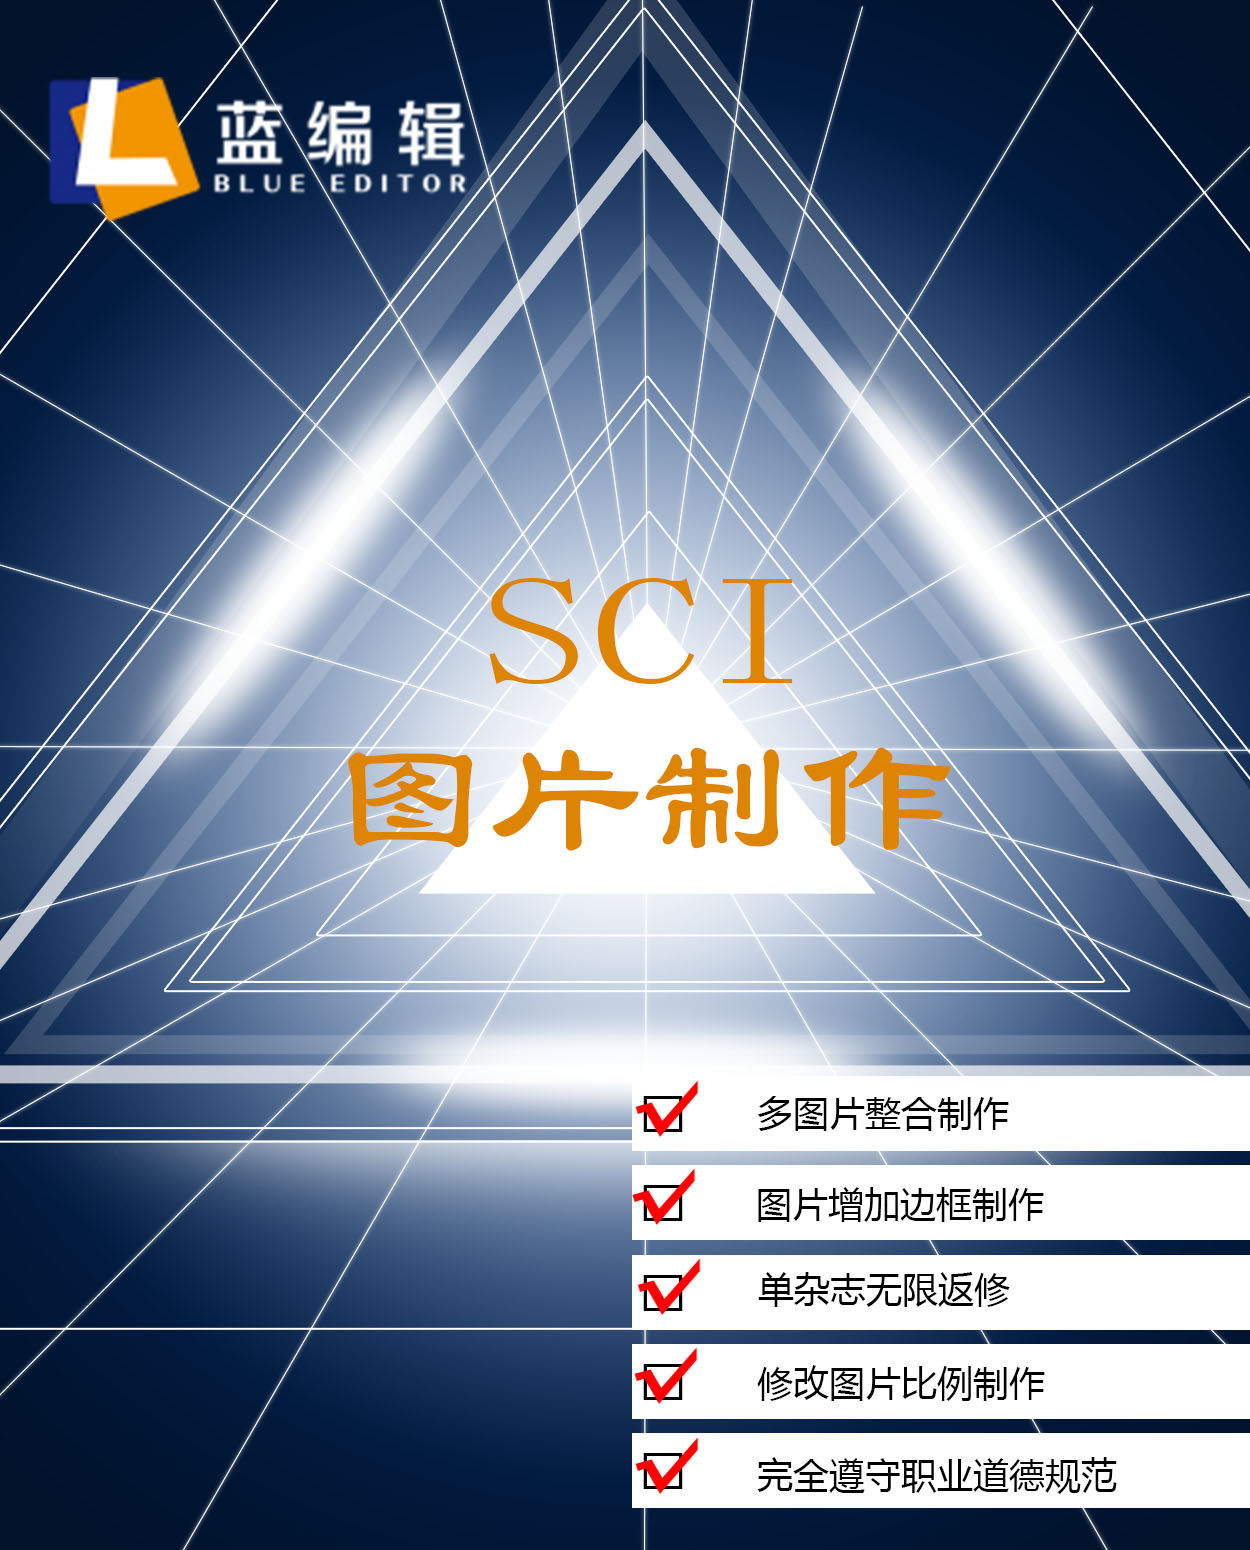 SCI图片制作